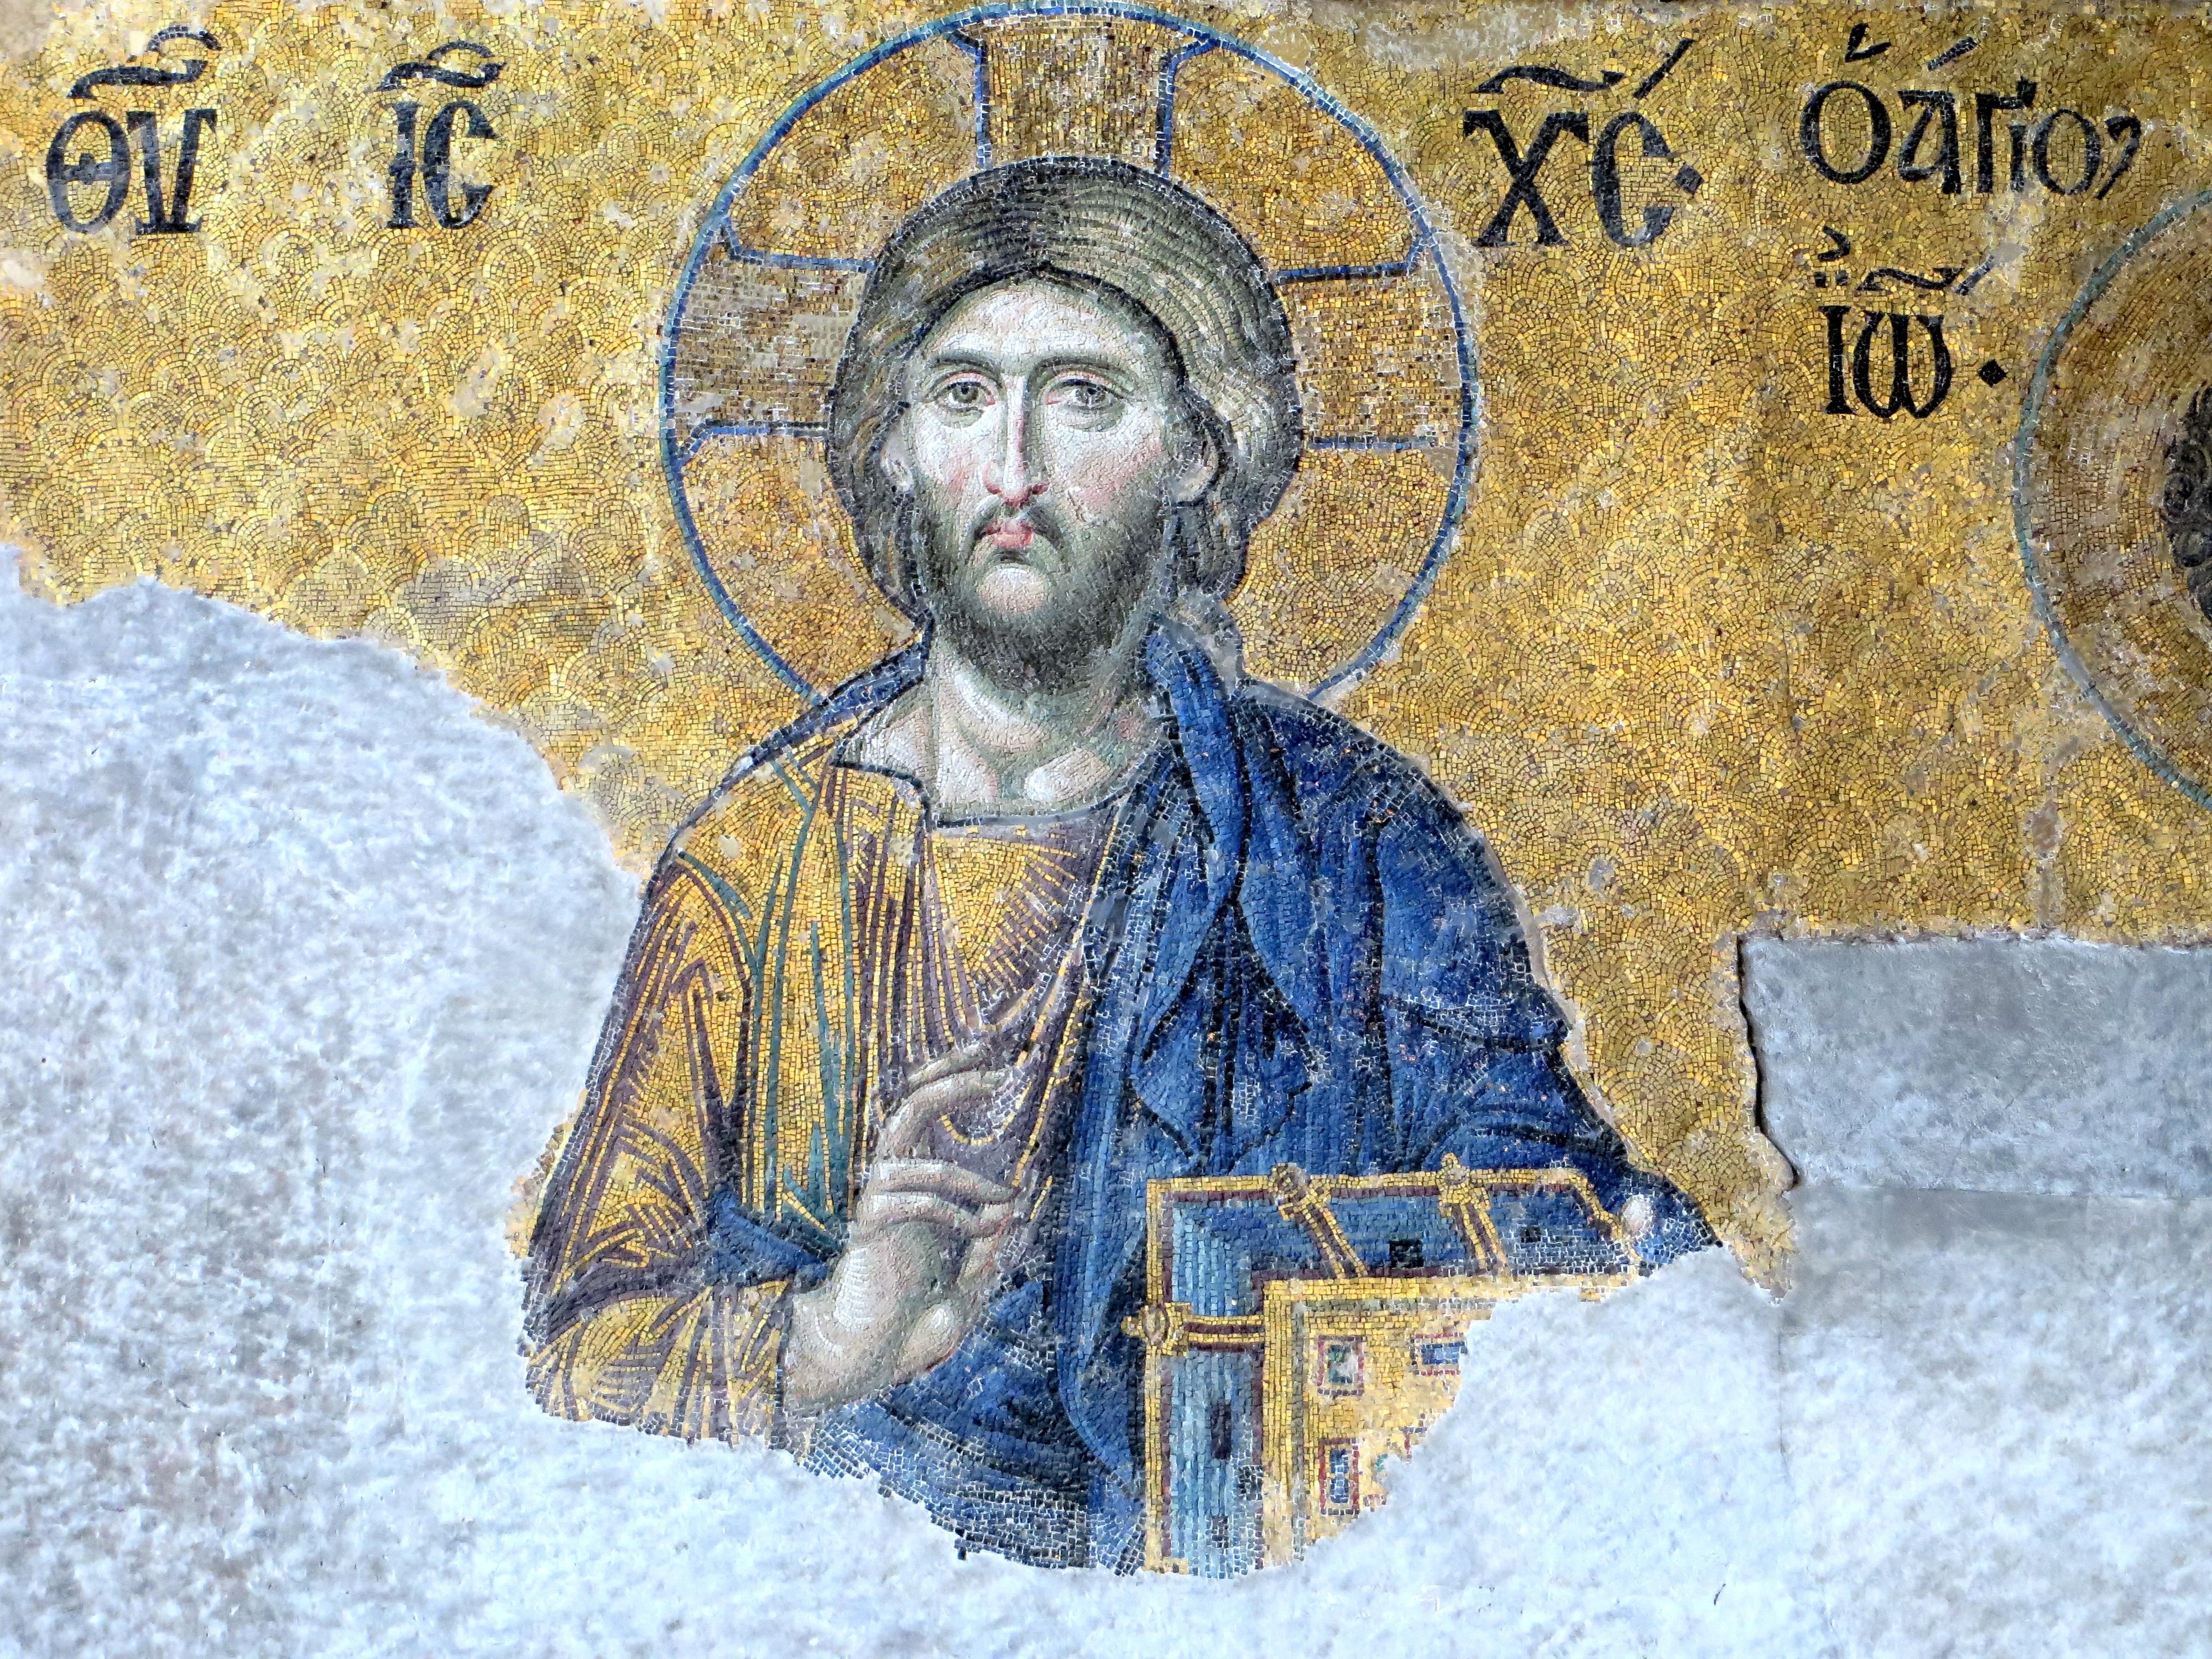 Free Images Old Sign Religion Church Artwork Bible Spiritual